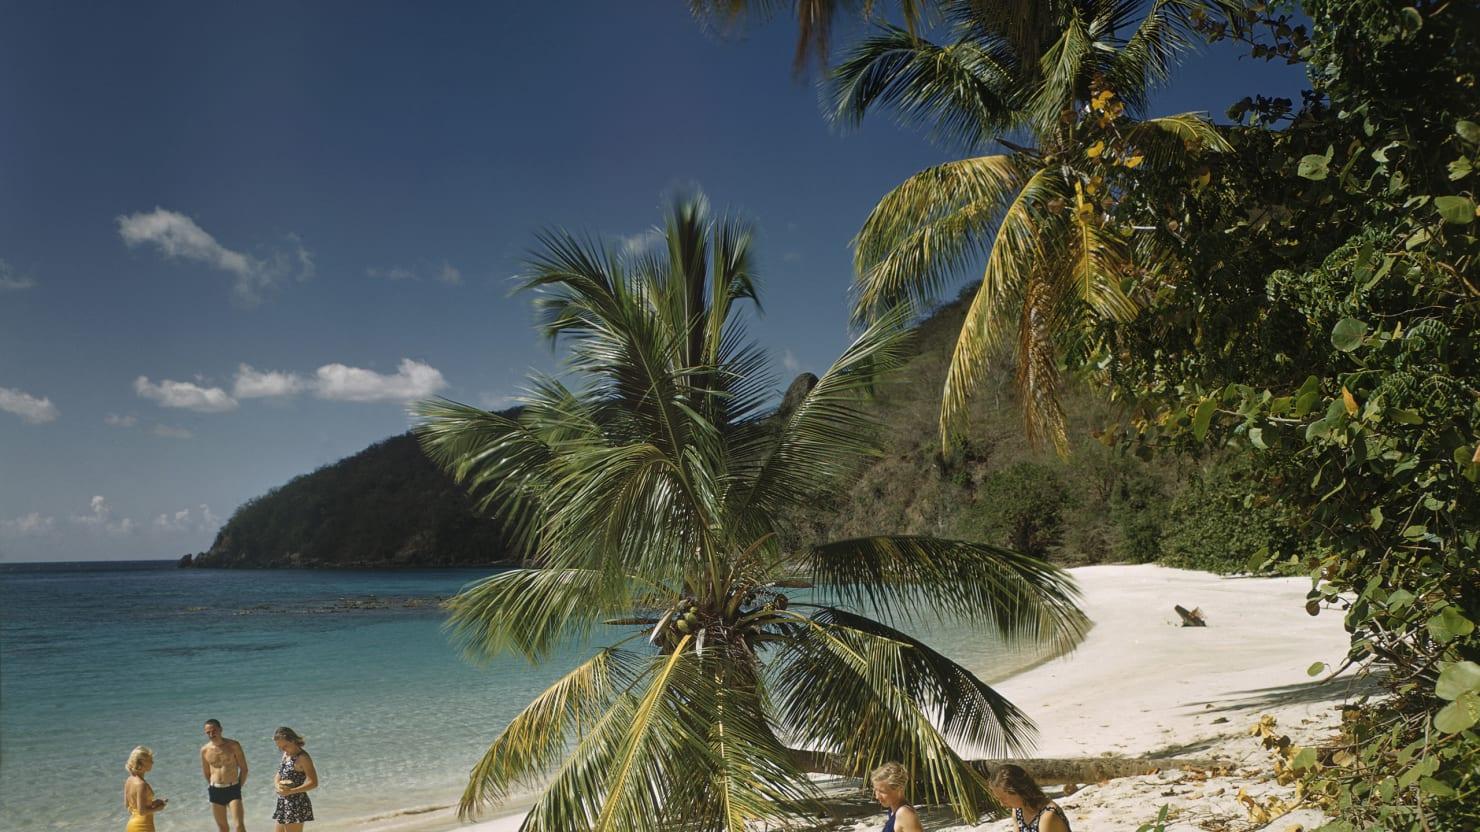 You Wish You Were Here: Classic Caribbean Glamor Shots